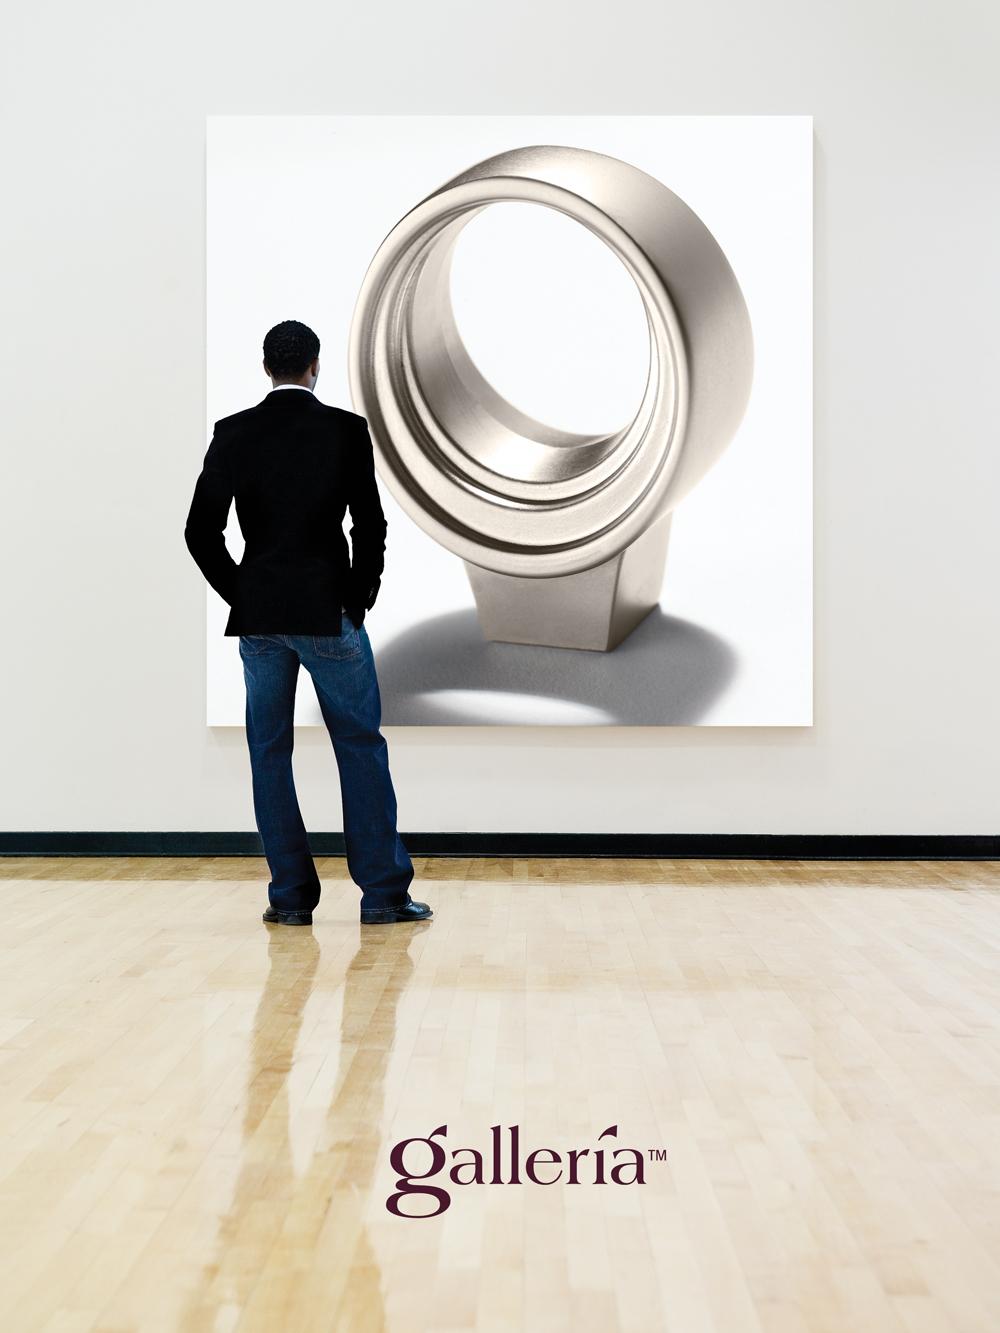 galleria3.jpg